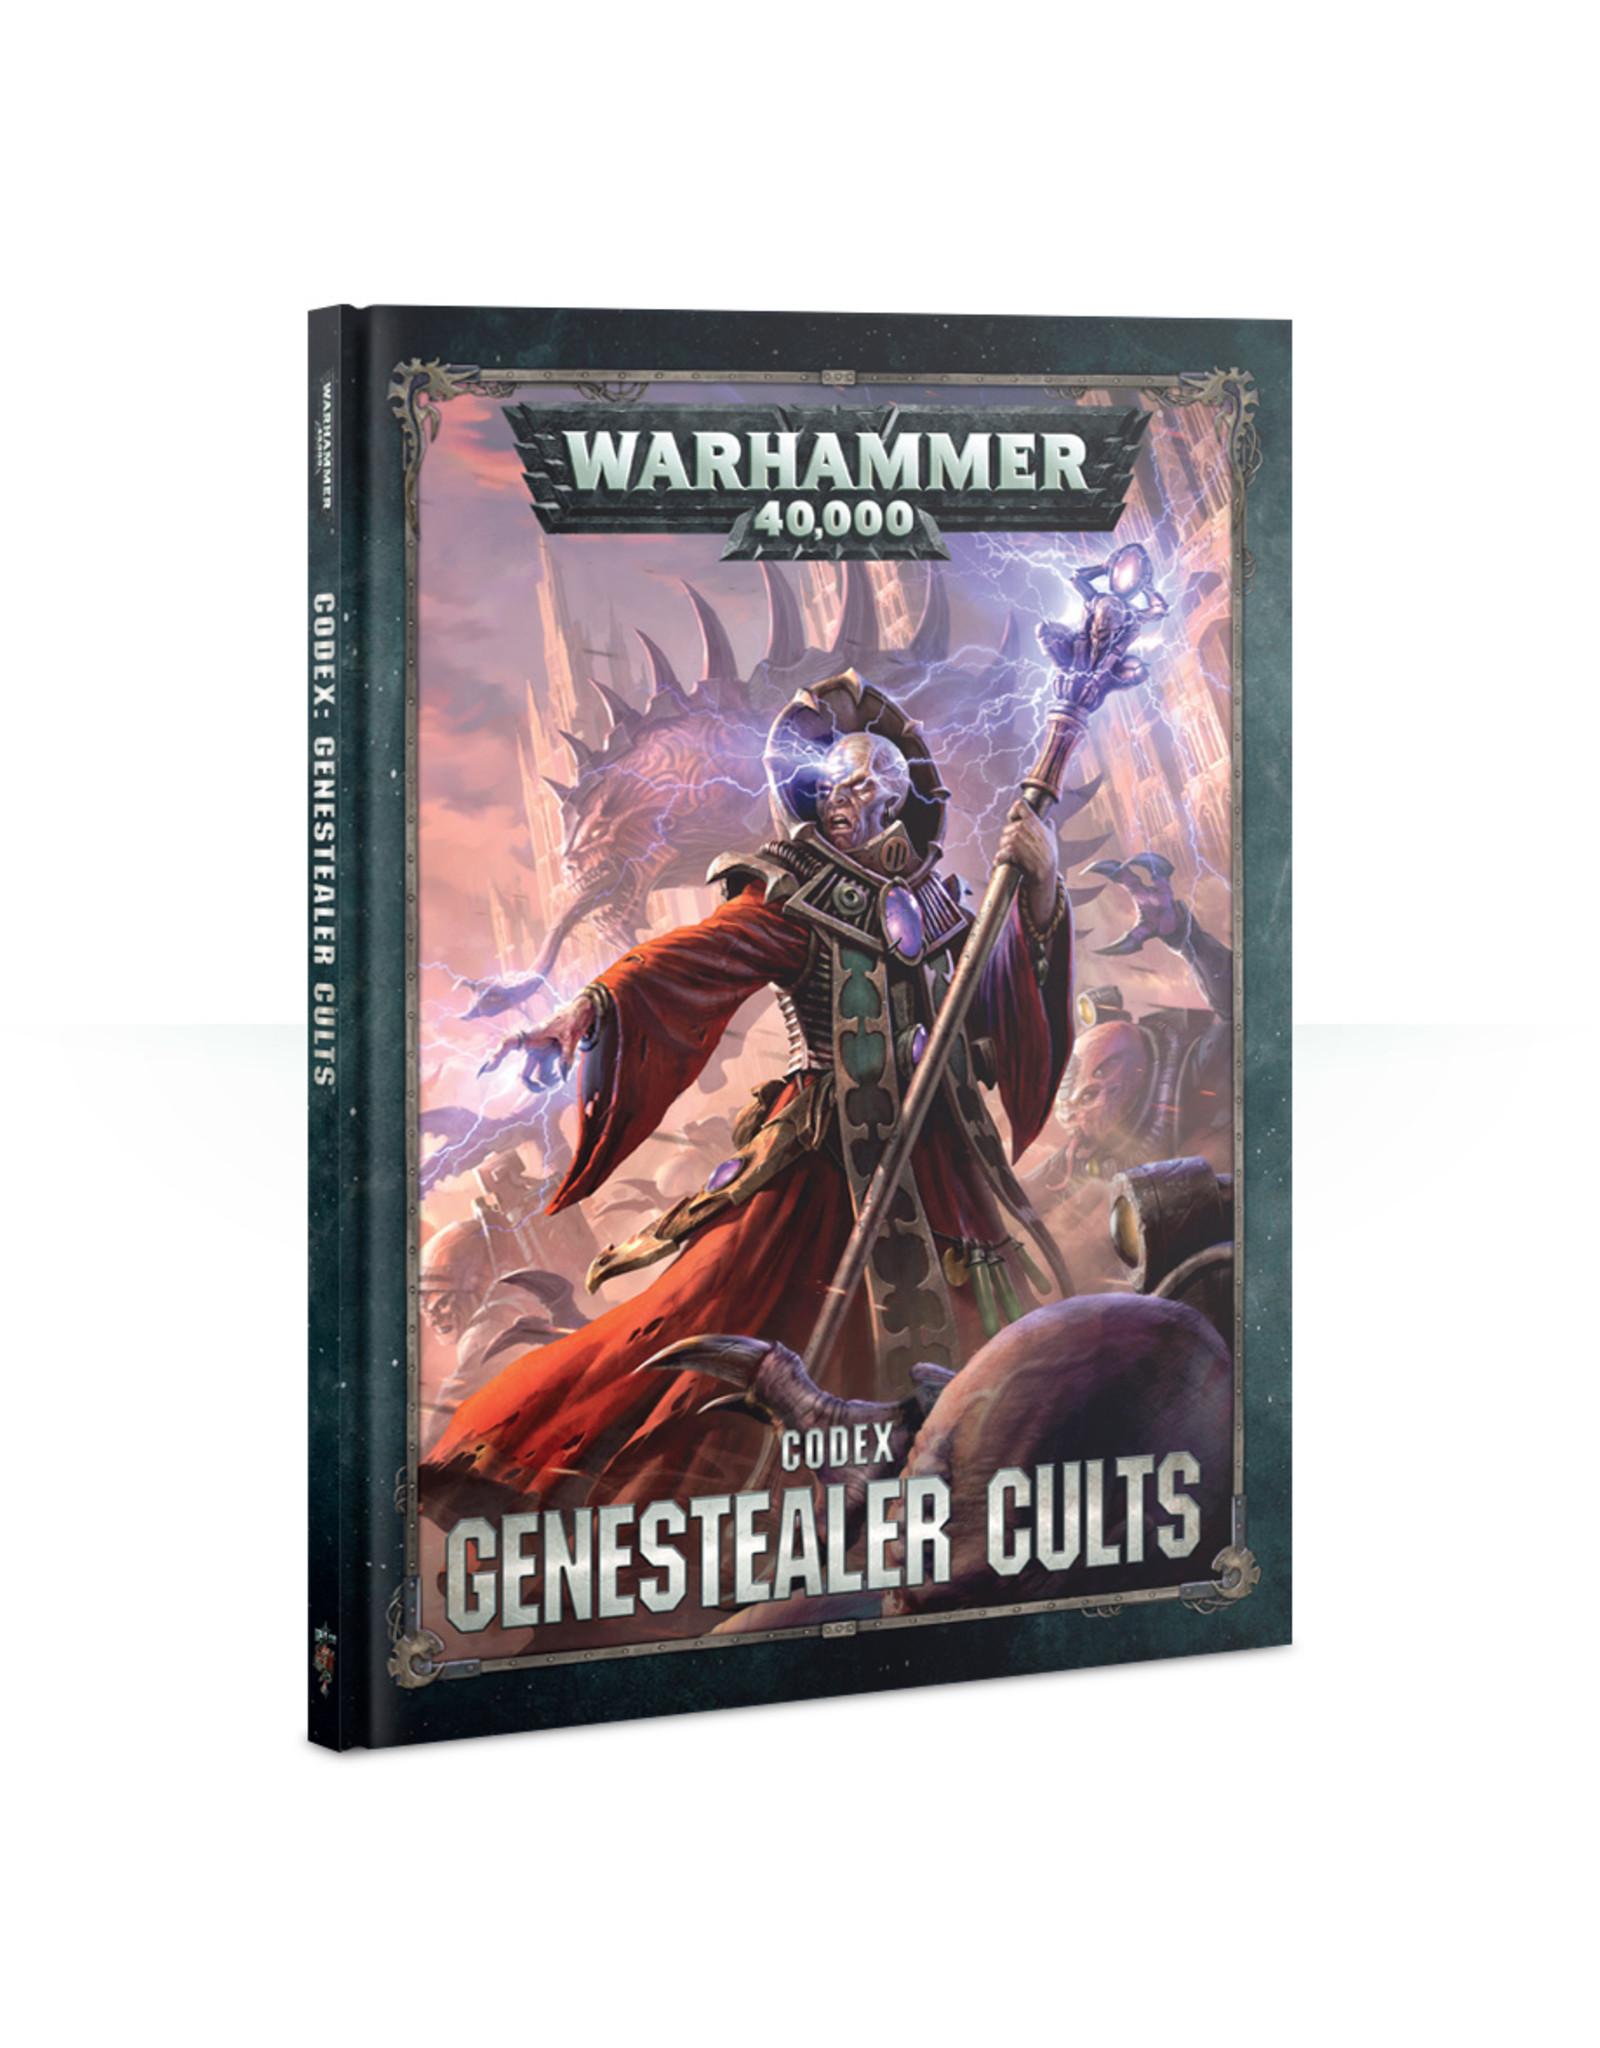 Warhammer 40K Codex: Genestealer Cults